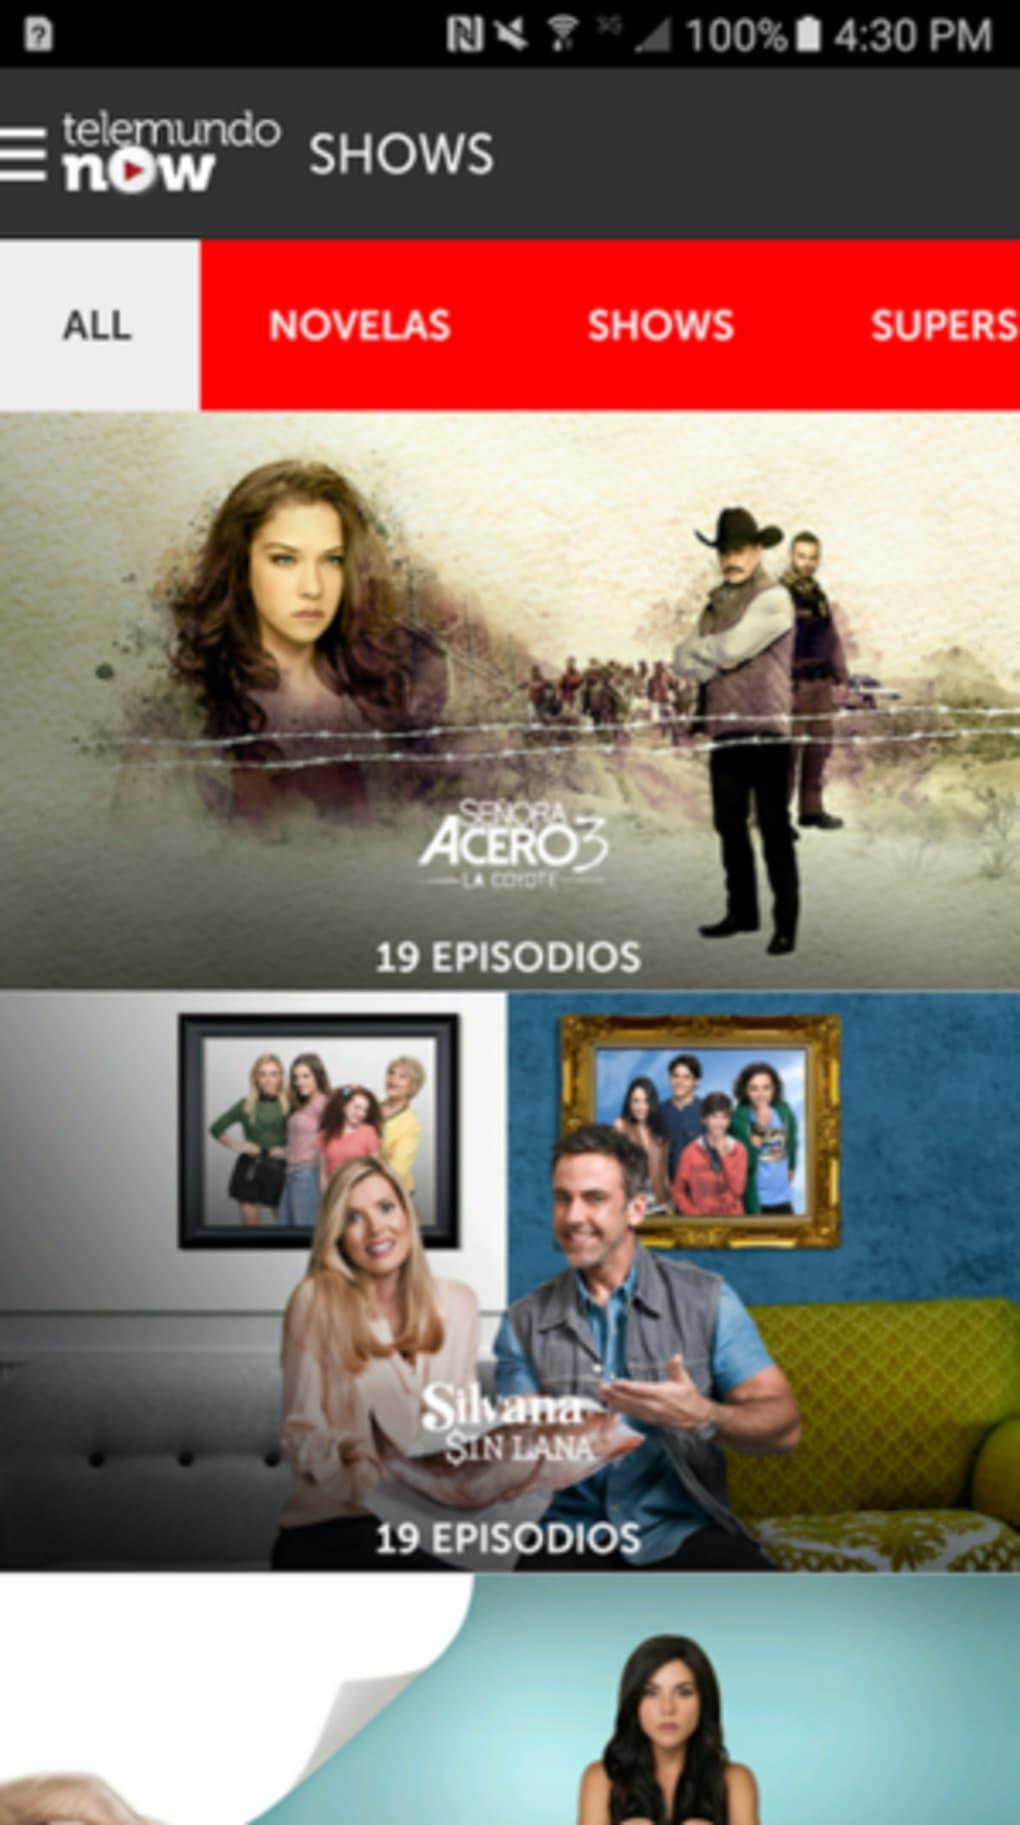 Telemundo Now for iPhone - Download